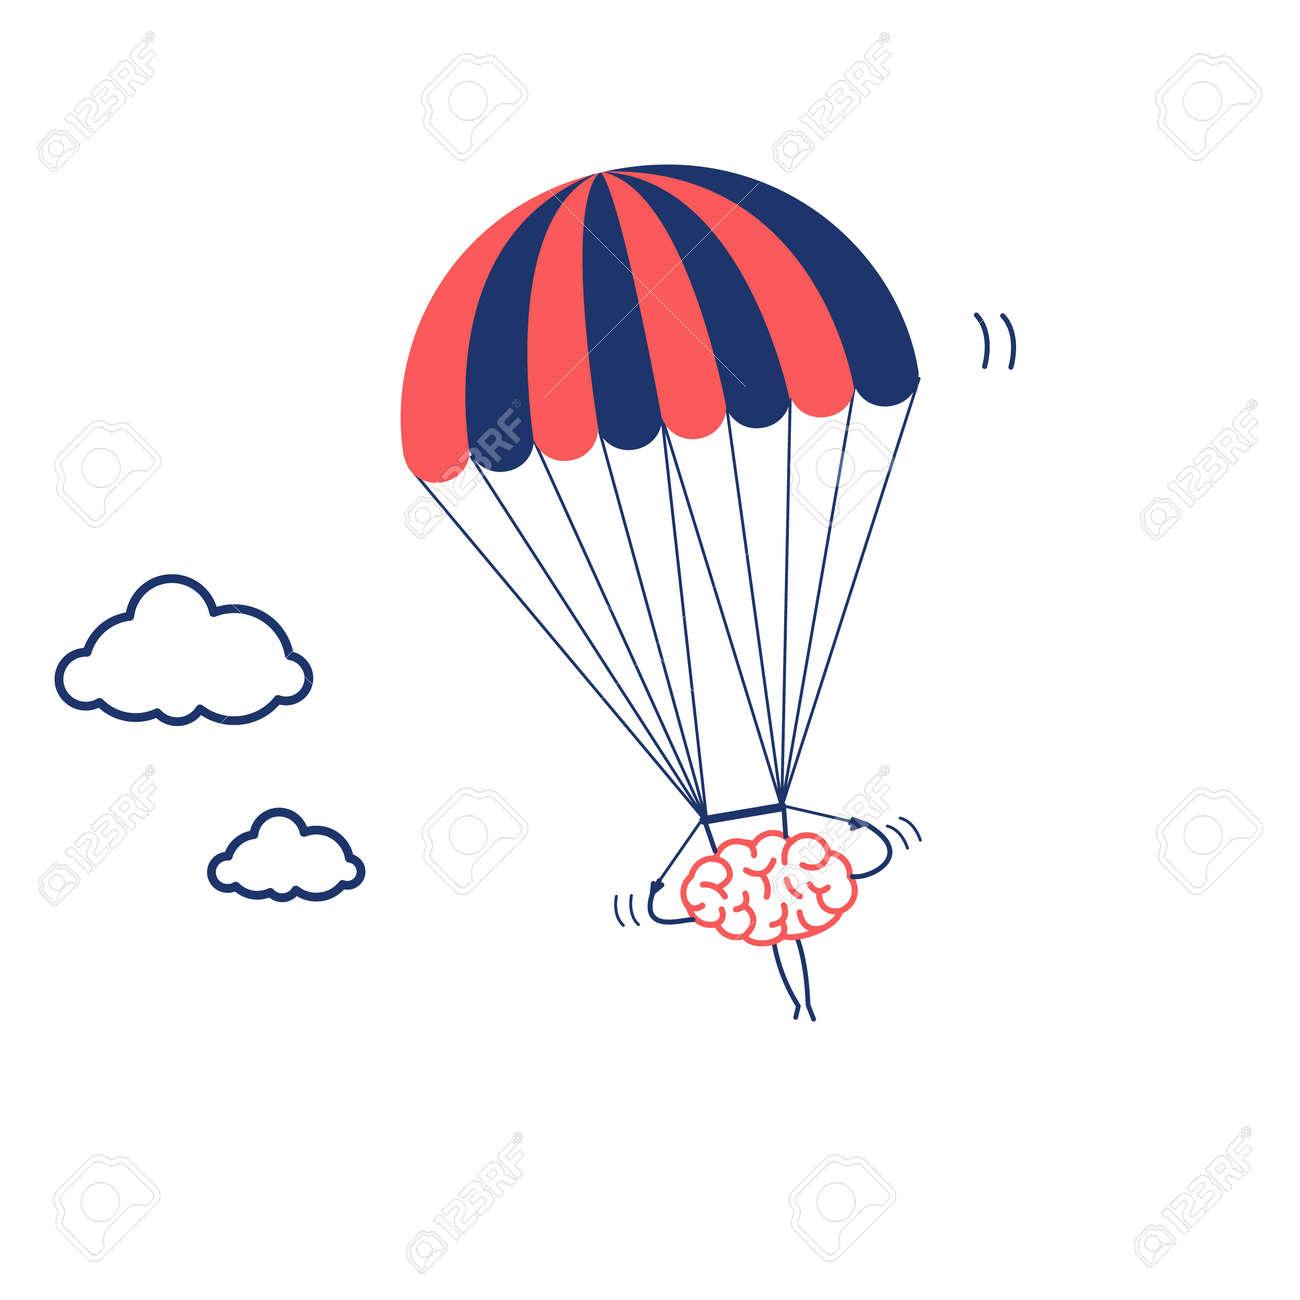 brain flying on parachute vector concept illustration of inventive rh 123rf com parachute vector free parachute vector free download